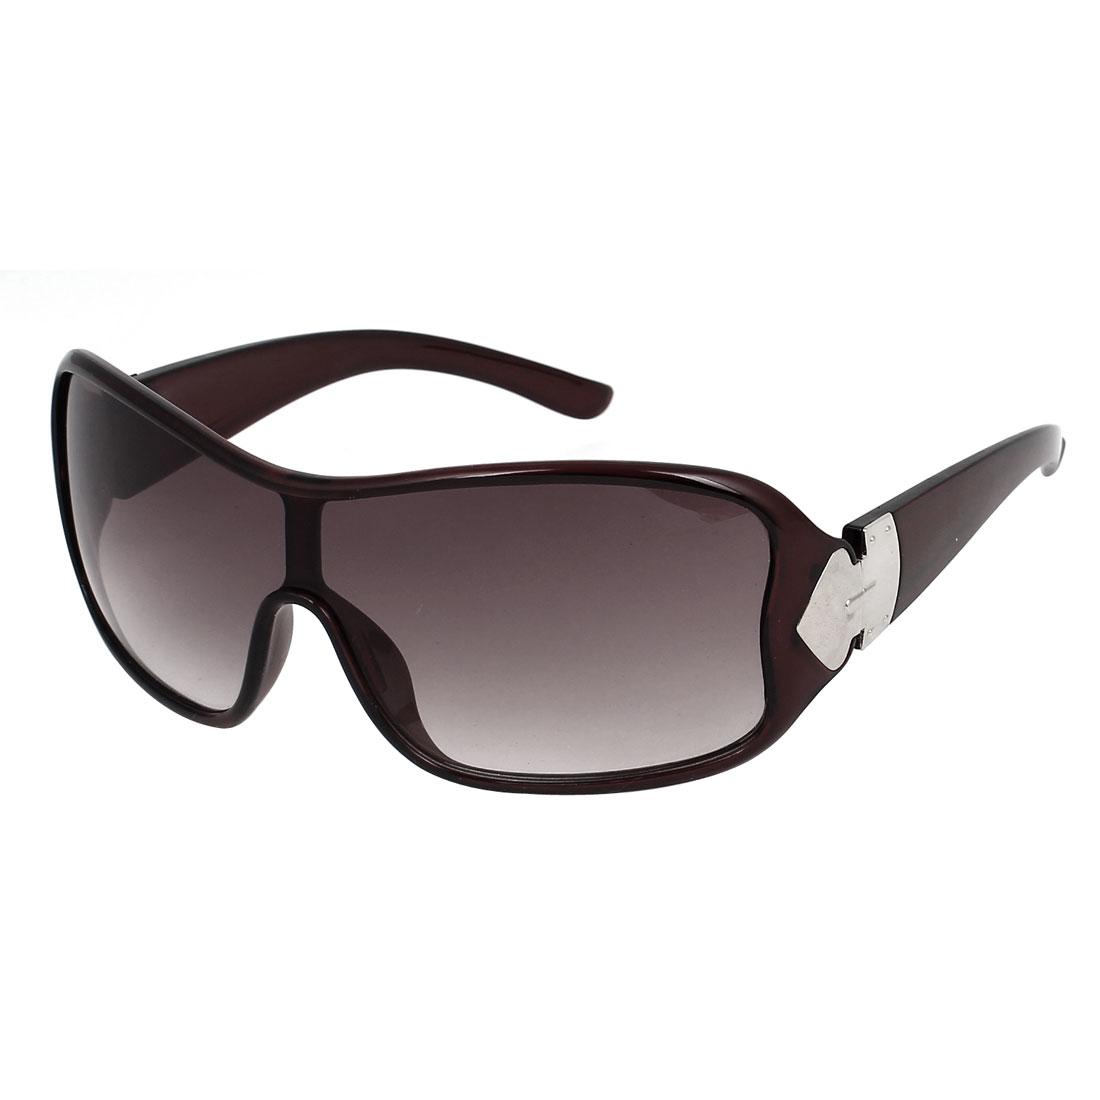 Plastic Full Rim Lady Single Bridge Eyewear Protector Sunglasses Brown